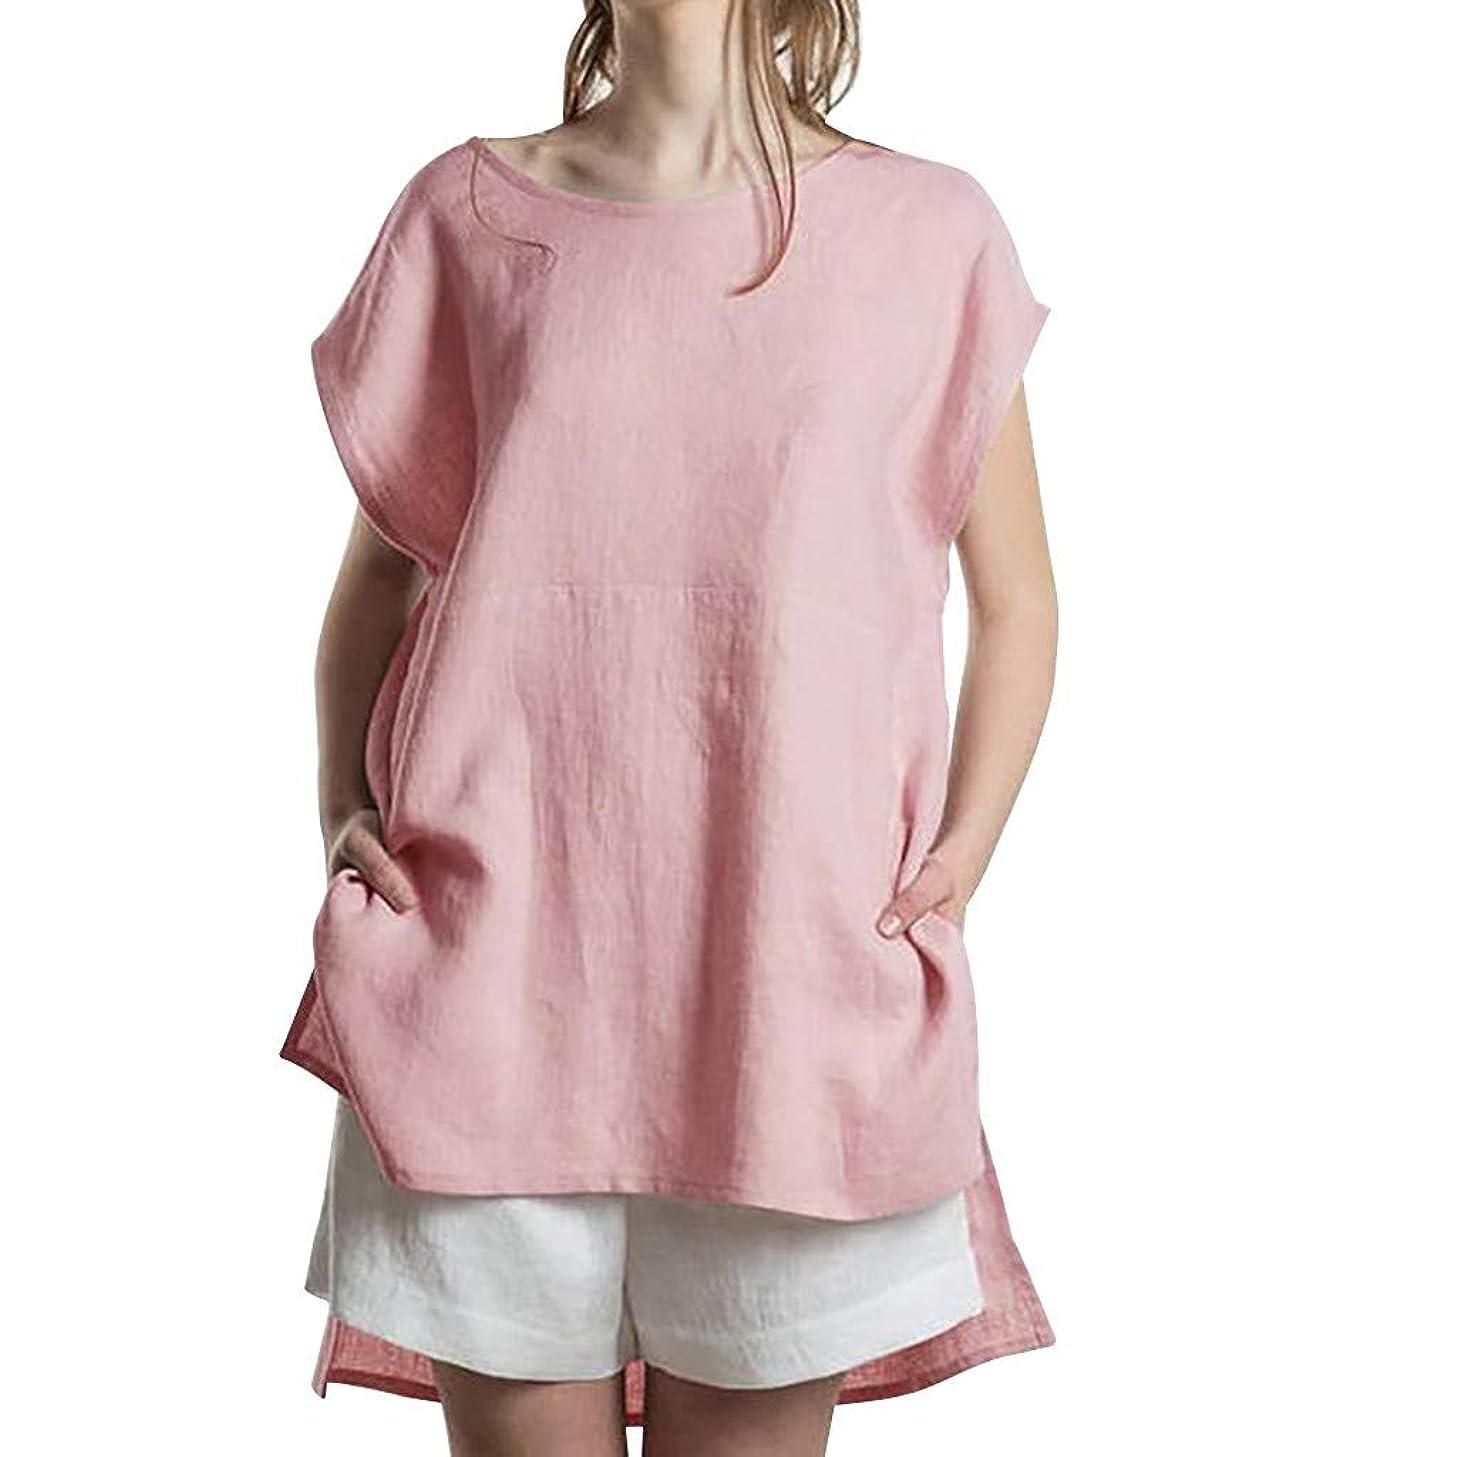 Botrong Womens Tops, Summer Casual Solid Color O Neck High Low Irregular Hem Short Sleeve Top